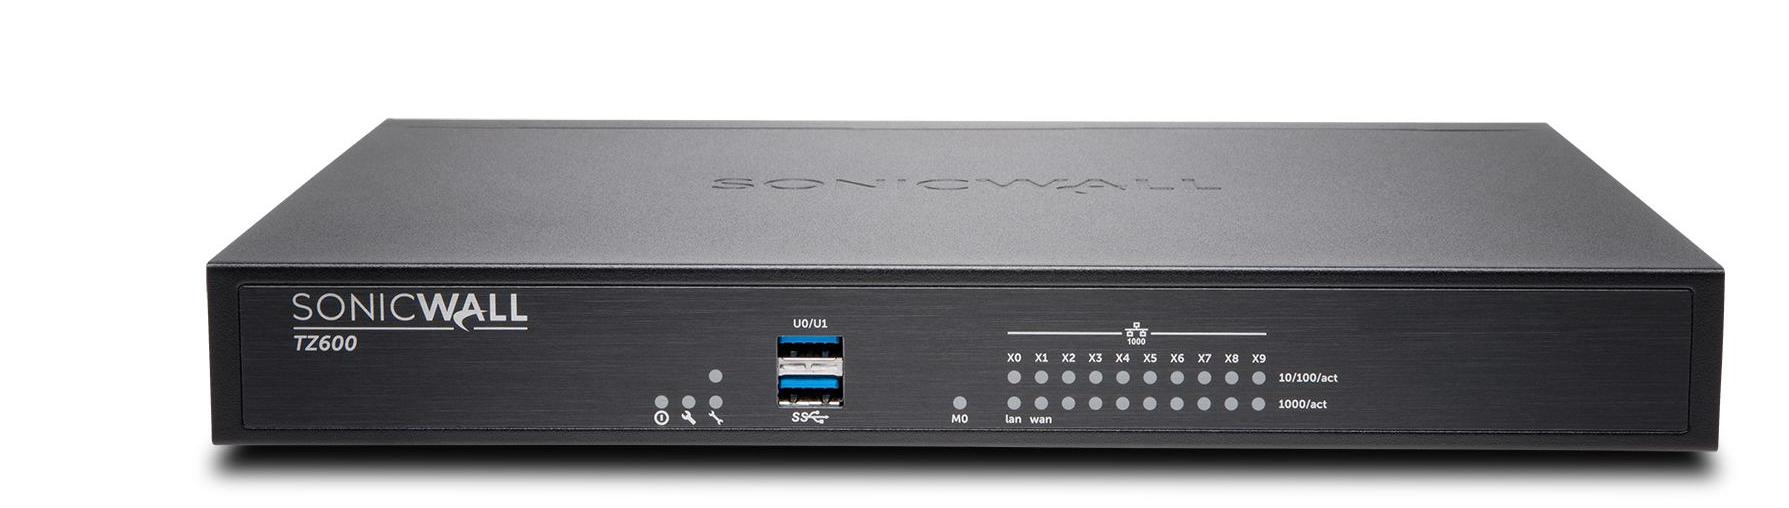 SonicWall TZ600 + Advanced Edition (2 Years) hardware firewall 1500 Mbit/s Desktop